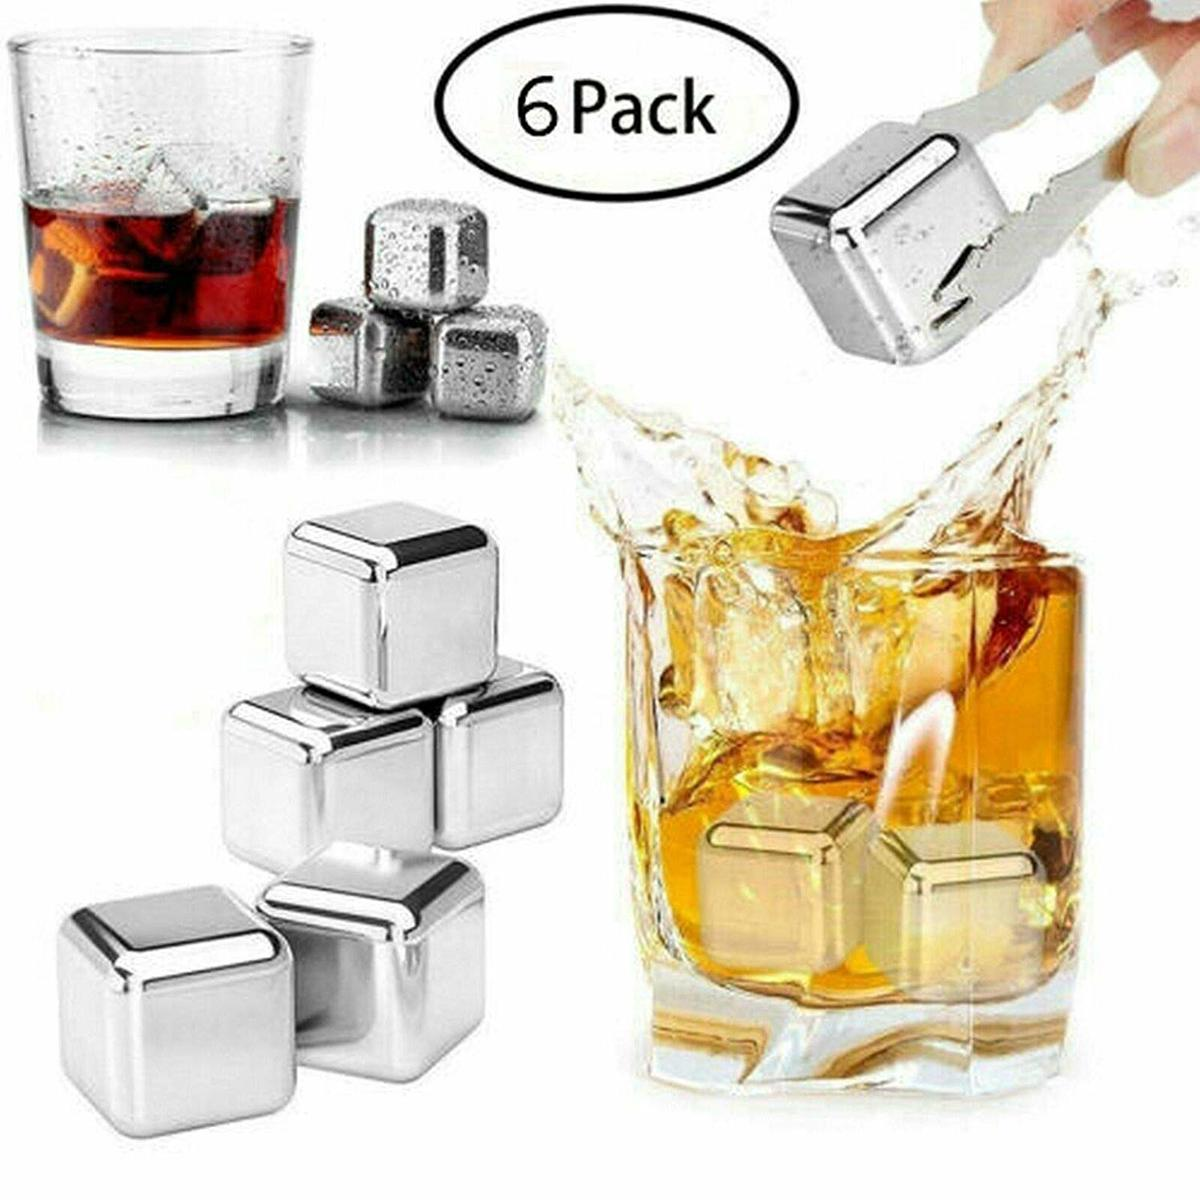 Aluminium Whiskey Stenen met Ijsblokjes Tang - 6 Stuks kopen